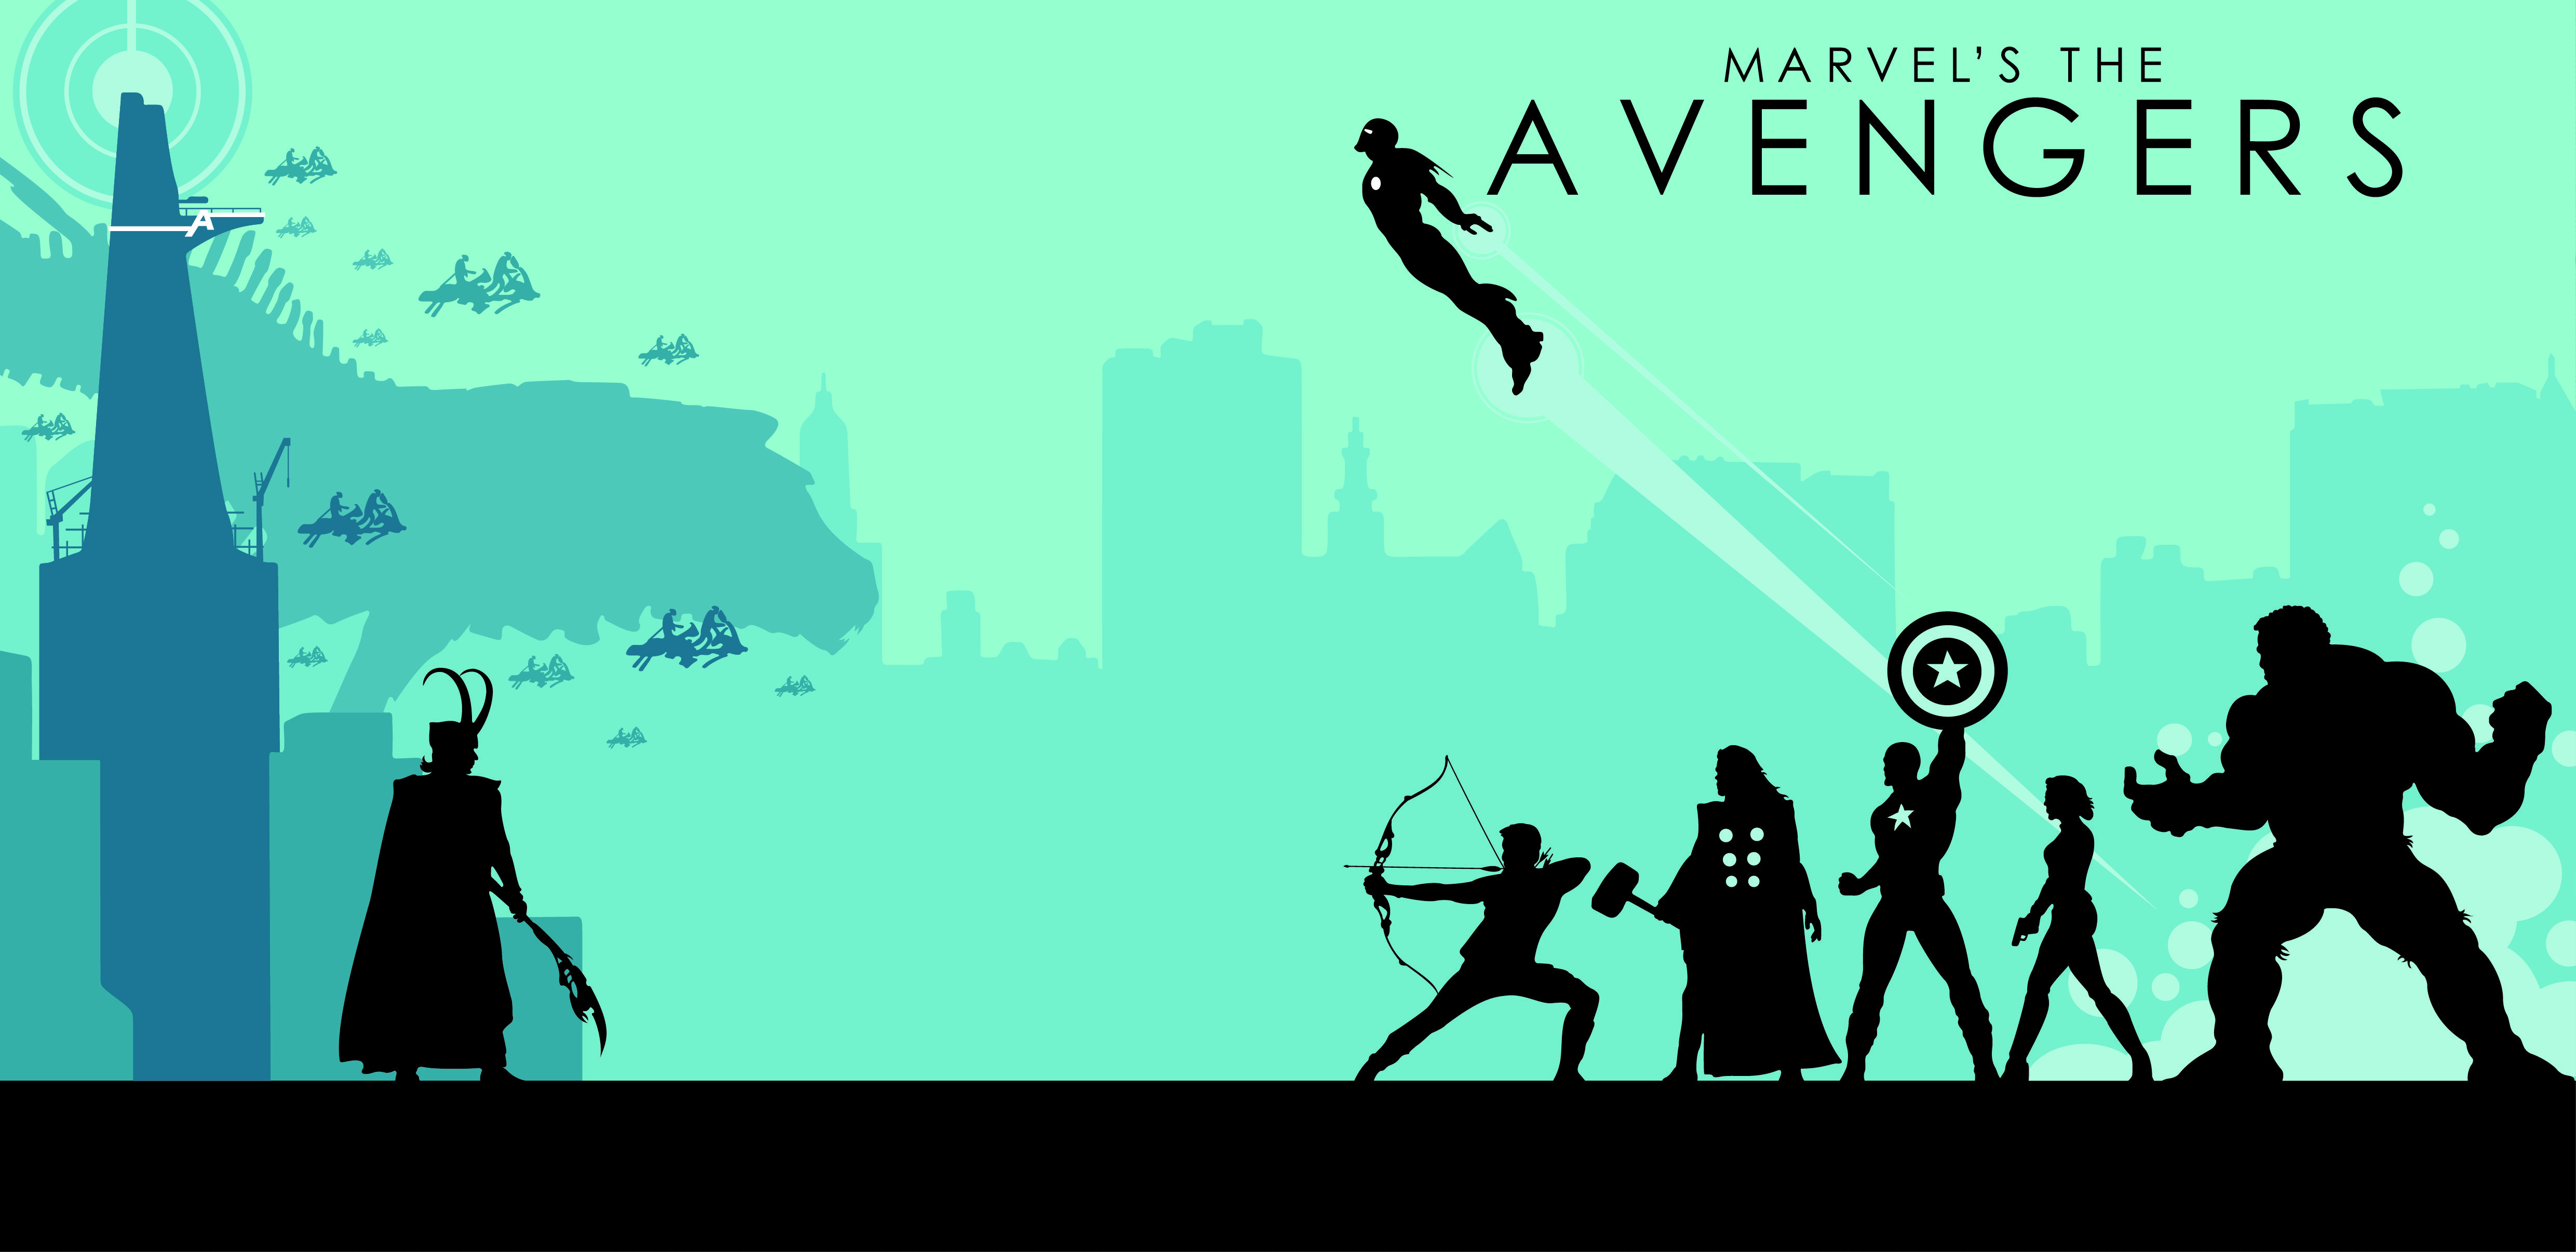 Avengers Laptop Wallpapers Top Free Avengers Laptop Backgrounds Wallpaperaccess